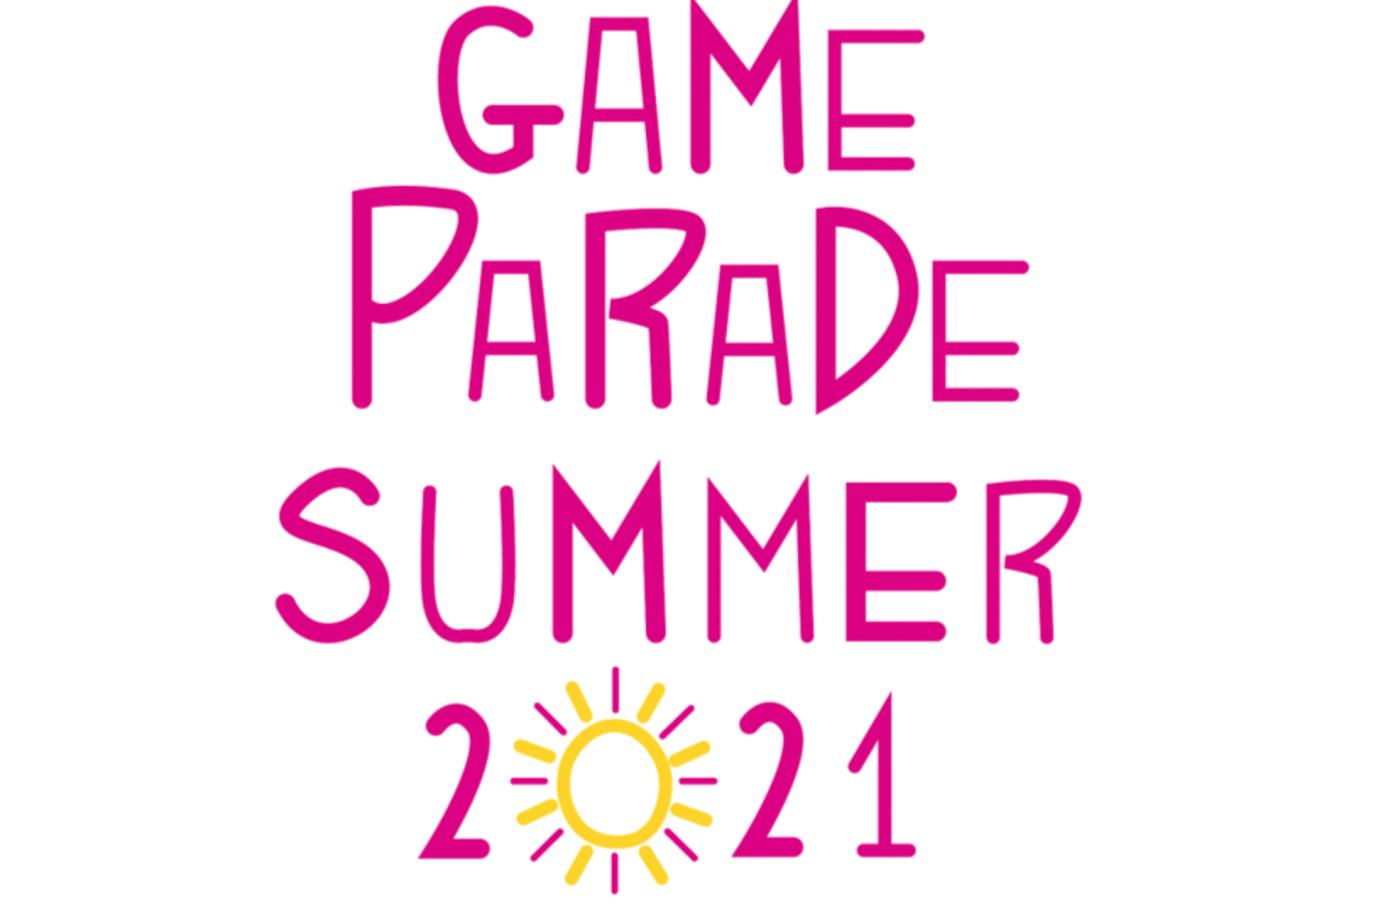 Game Parade Summer 2021